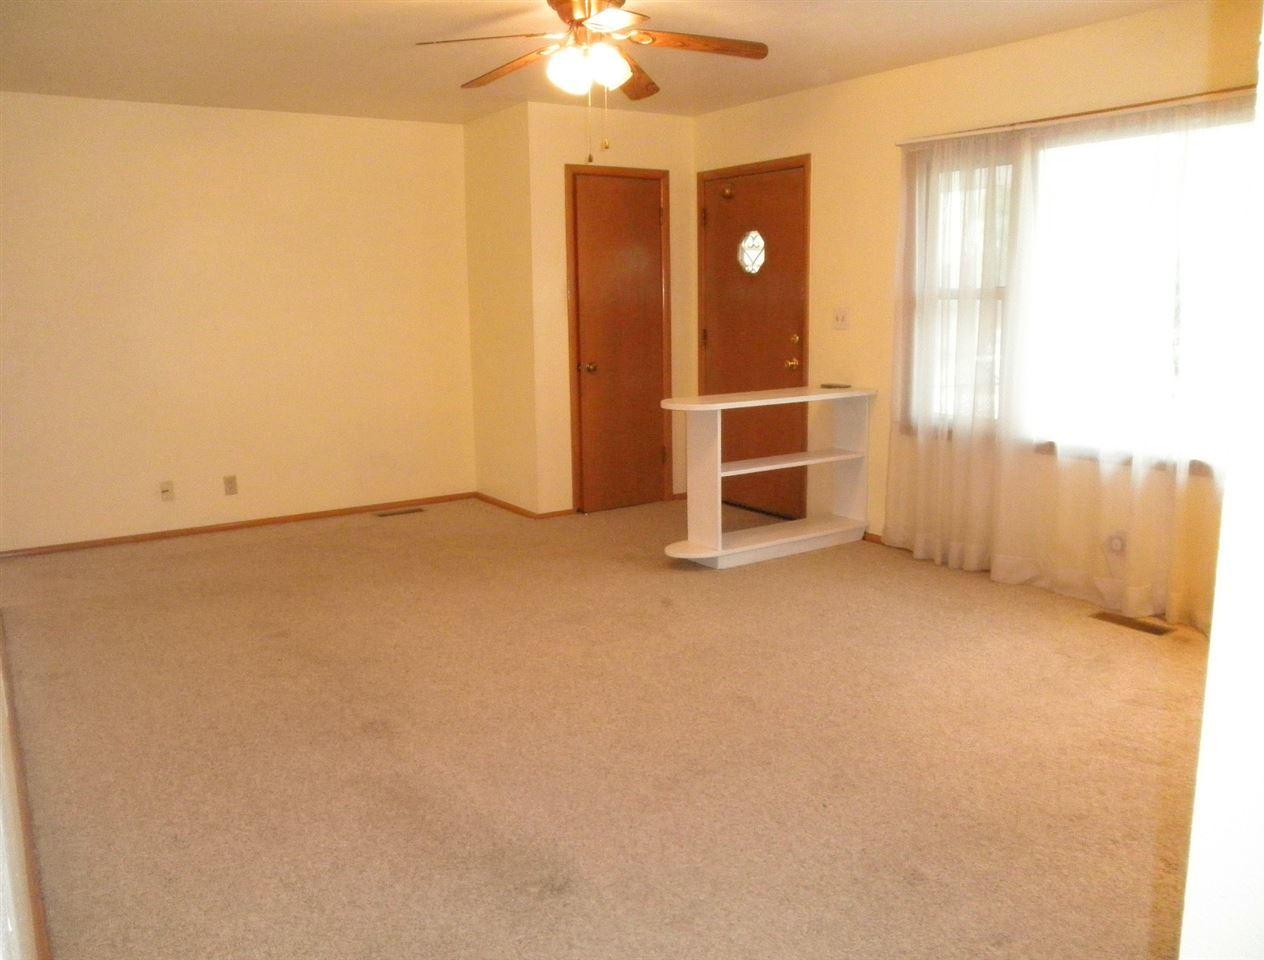 Sold Cross Sale W/ MLS | 508 Glendale  Ponca City, OK 74601 2